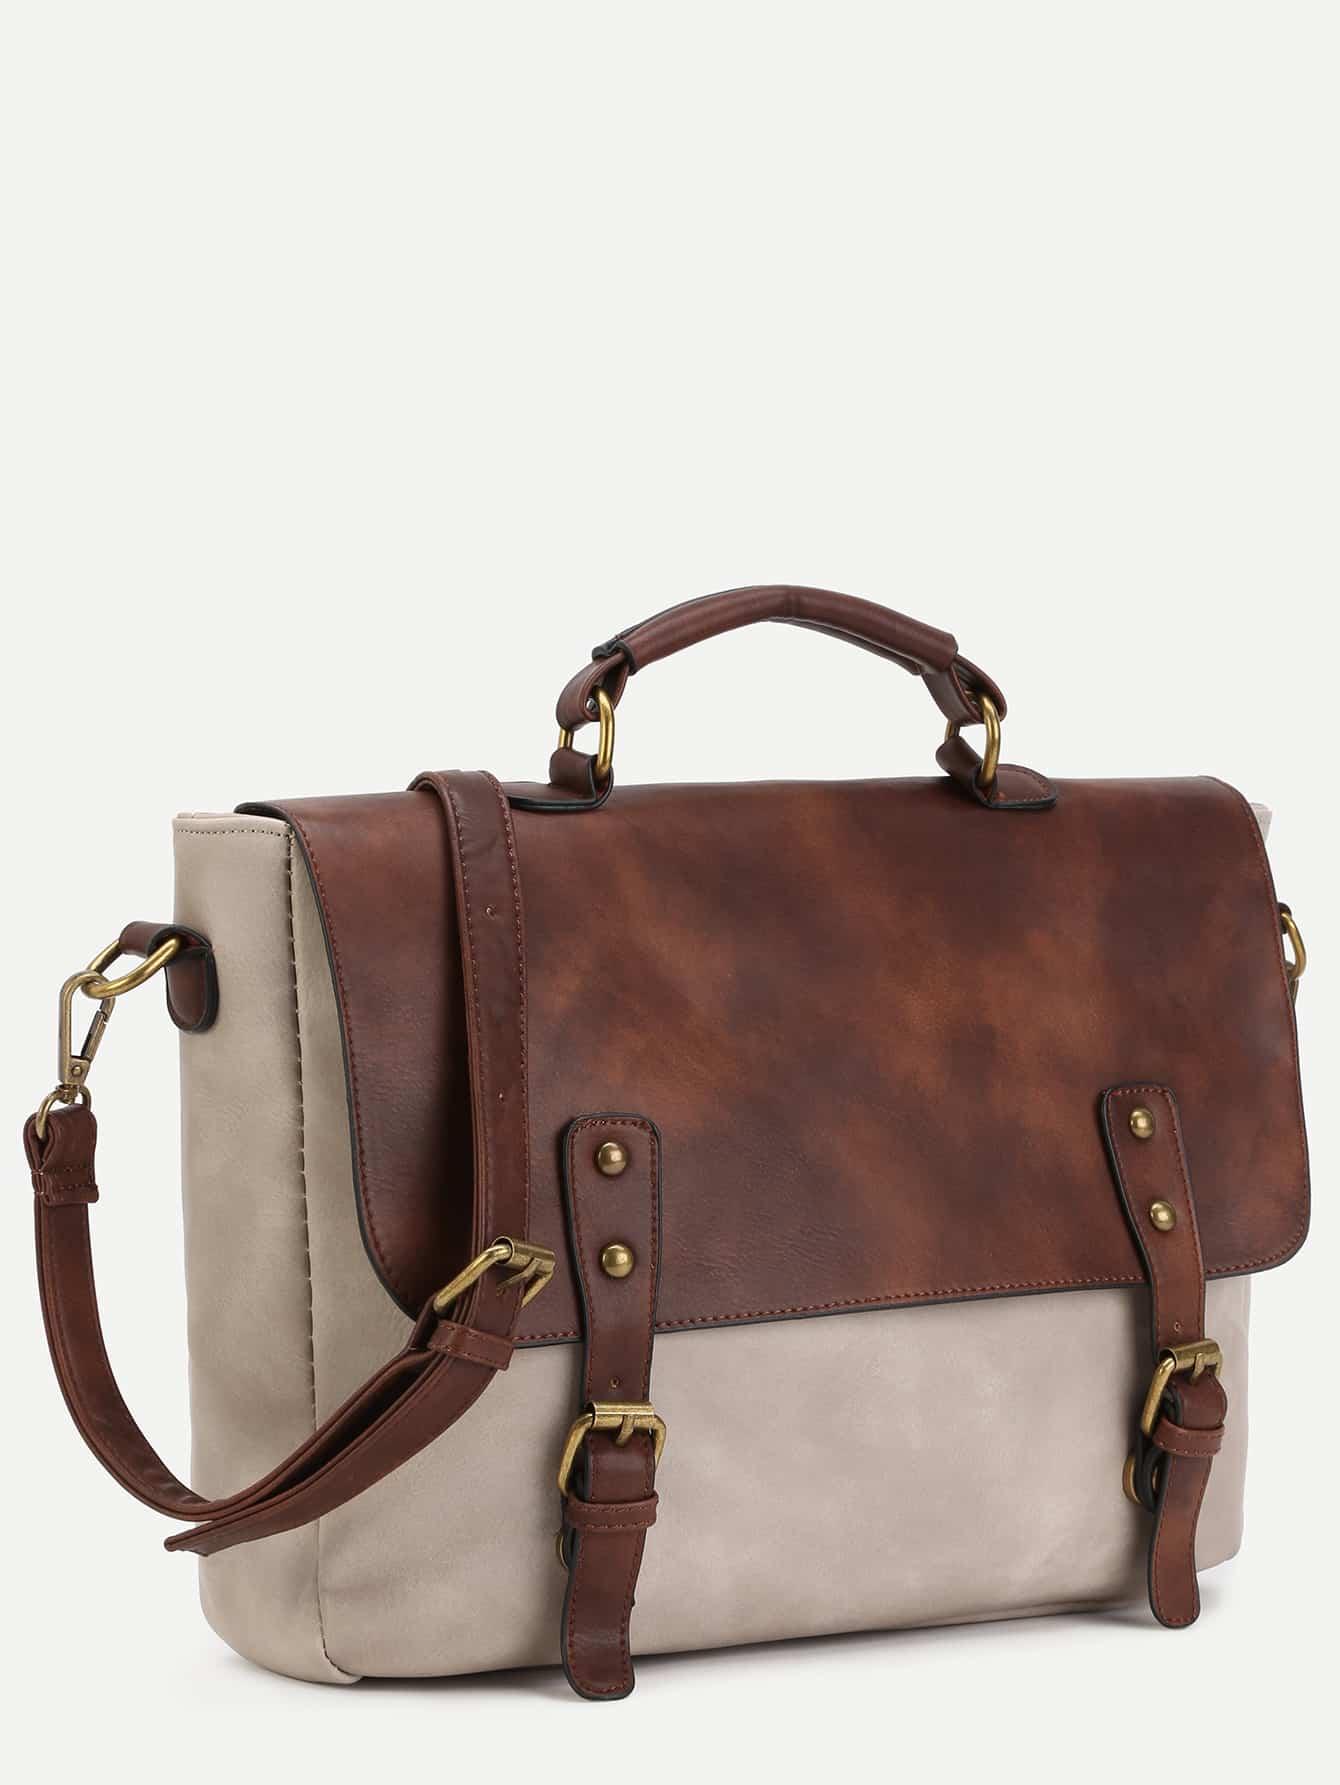 Bolsa Estilo Cambridge Satchel : Bolso satchel de pu con hebillas spanish romwe